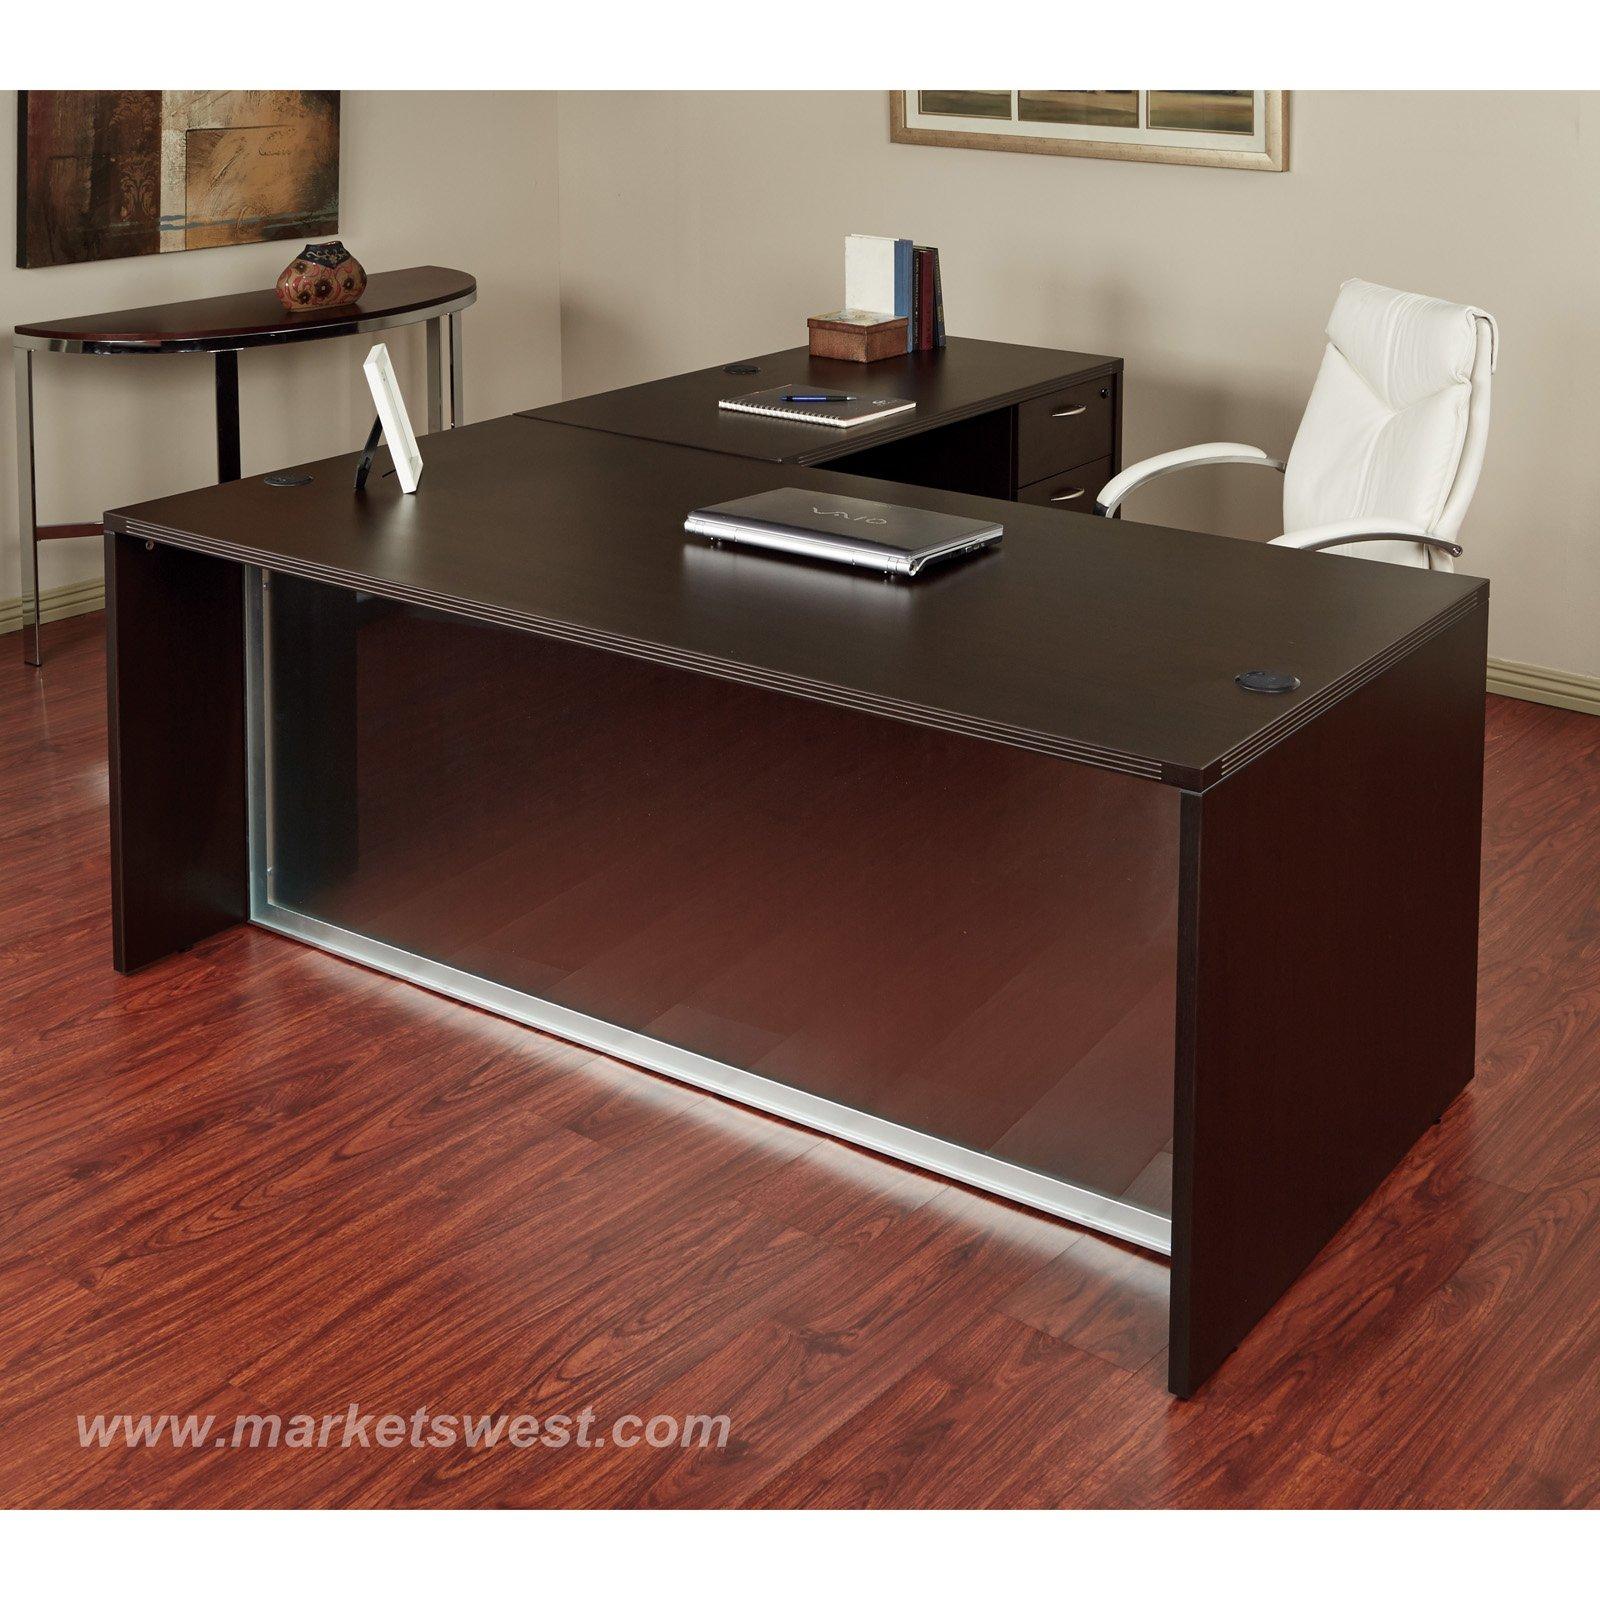 L Shape Desk 72 Quot X84 Quot With Glass Front Espresso Or Urban